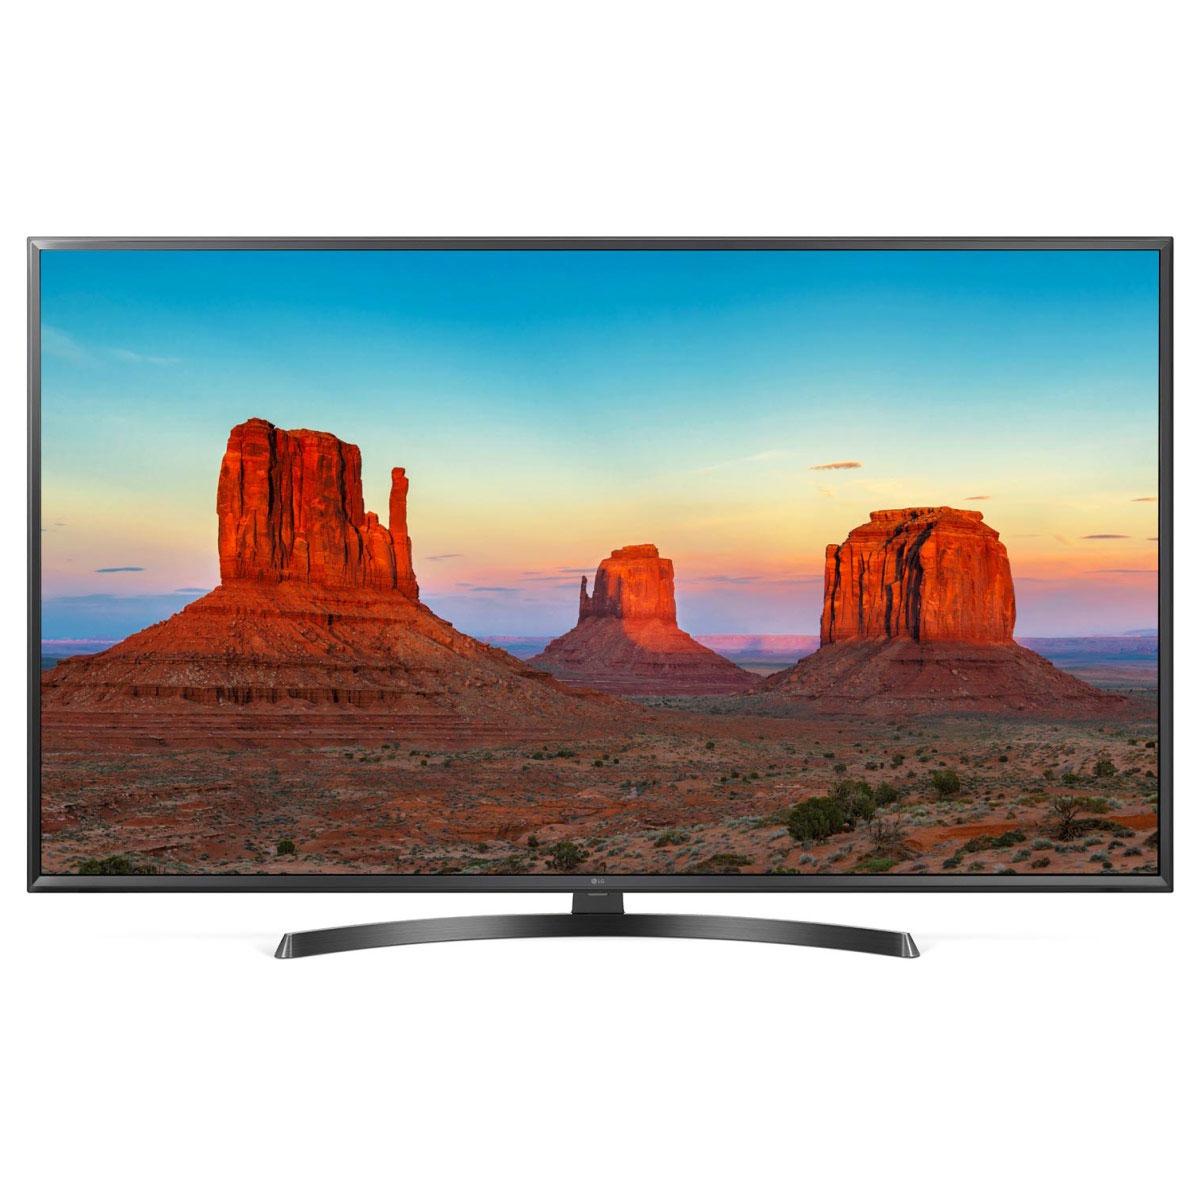 "TV LG 49UK6470 Téléviseur LED 4K 49"" (124 cm) 16/9 - 3840 x 2160 pixels - Ultra HD 2160p - HDR - Wi-Fi - Bluetooth - 1600 Hz"